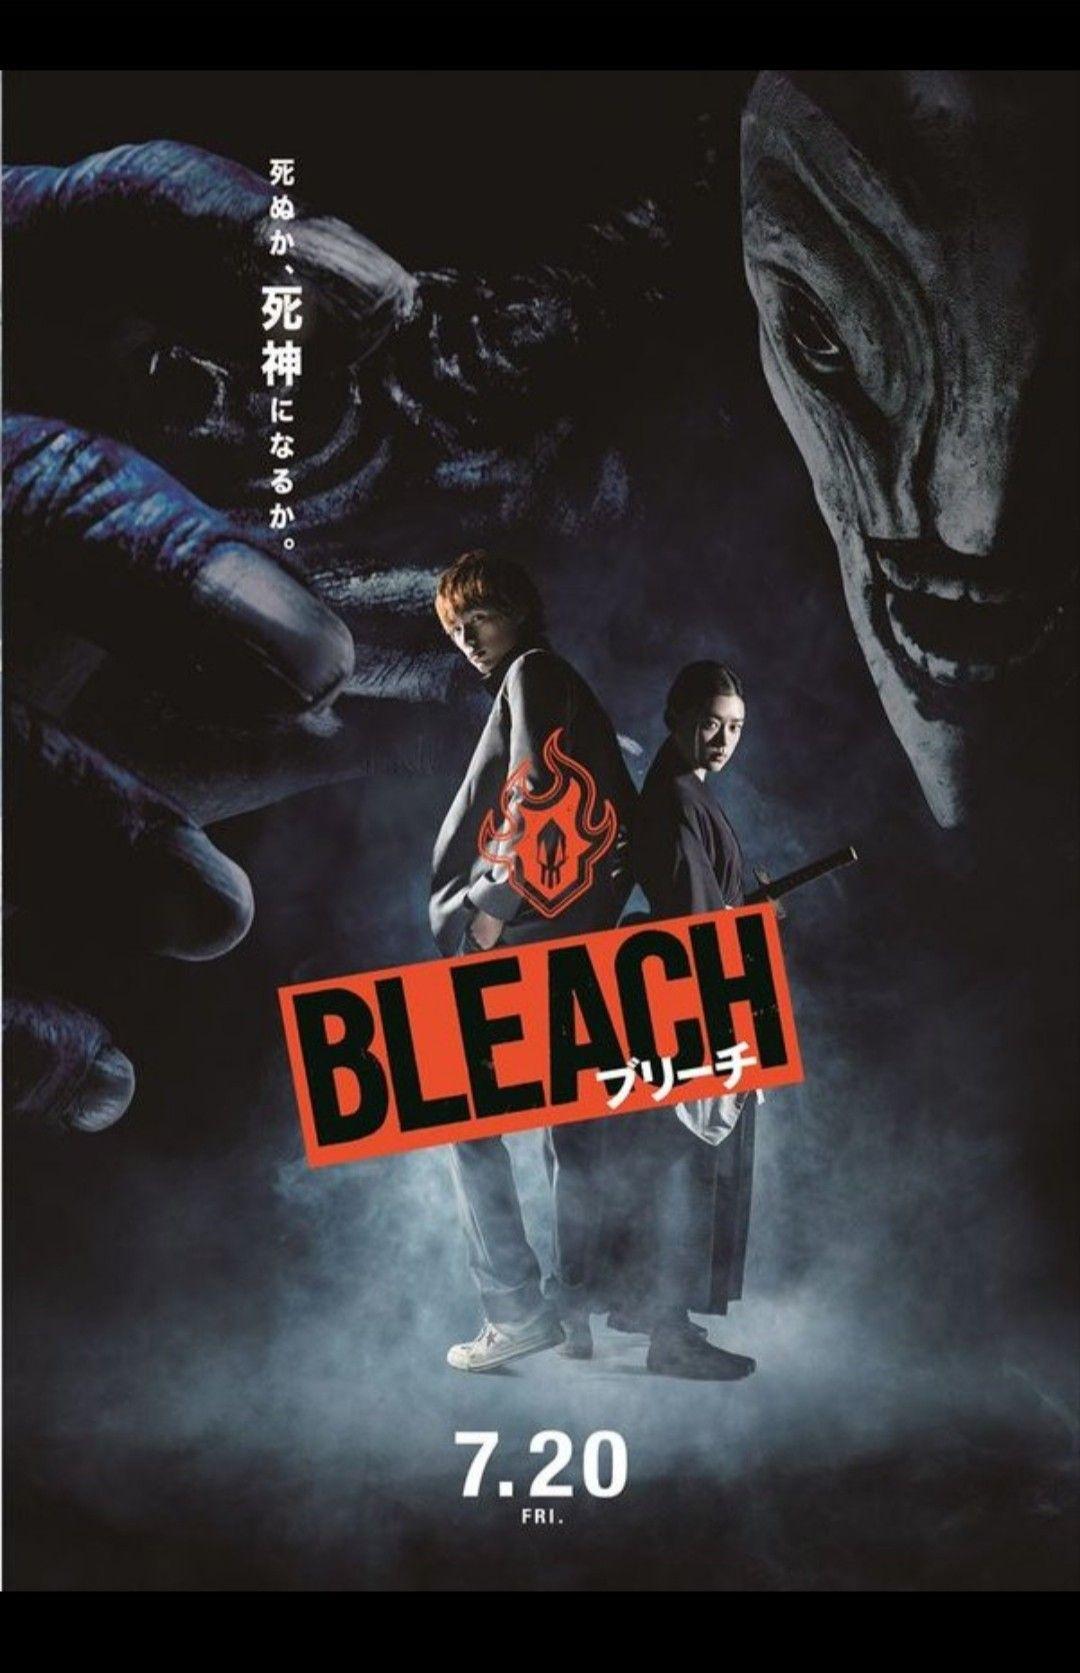 Sota Fukushi Bleach movie, Full movies, Full movies